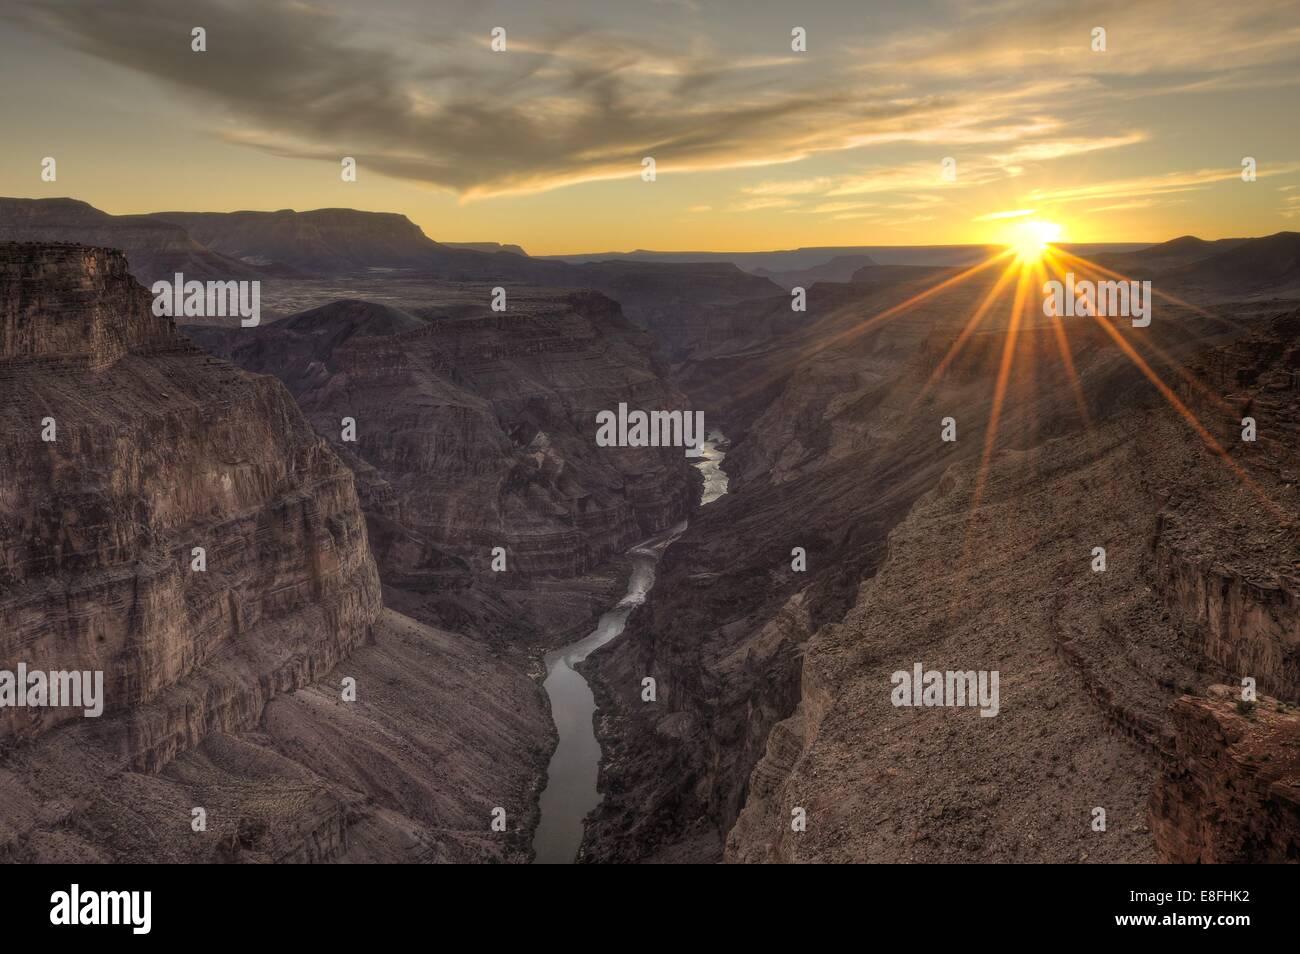 Arizona, Grand Canyon National Park, el atardecer en Toroweap Foto de stock